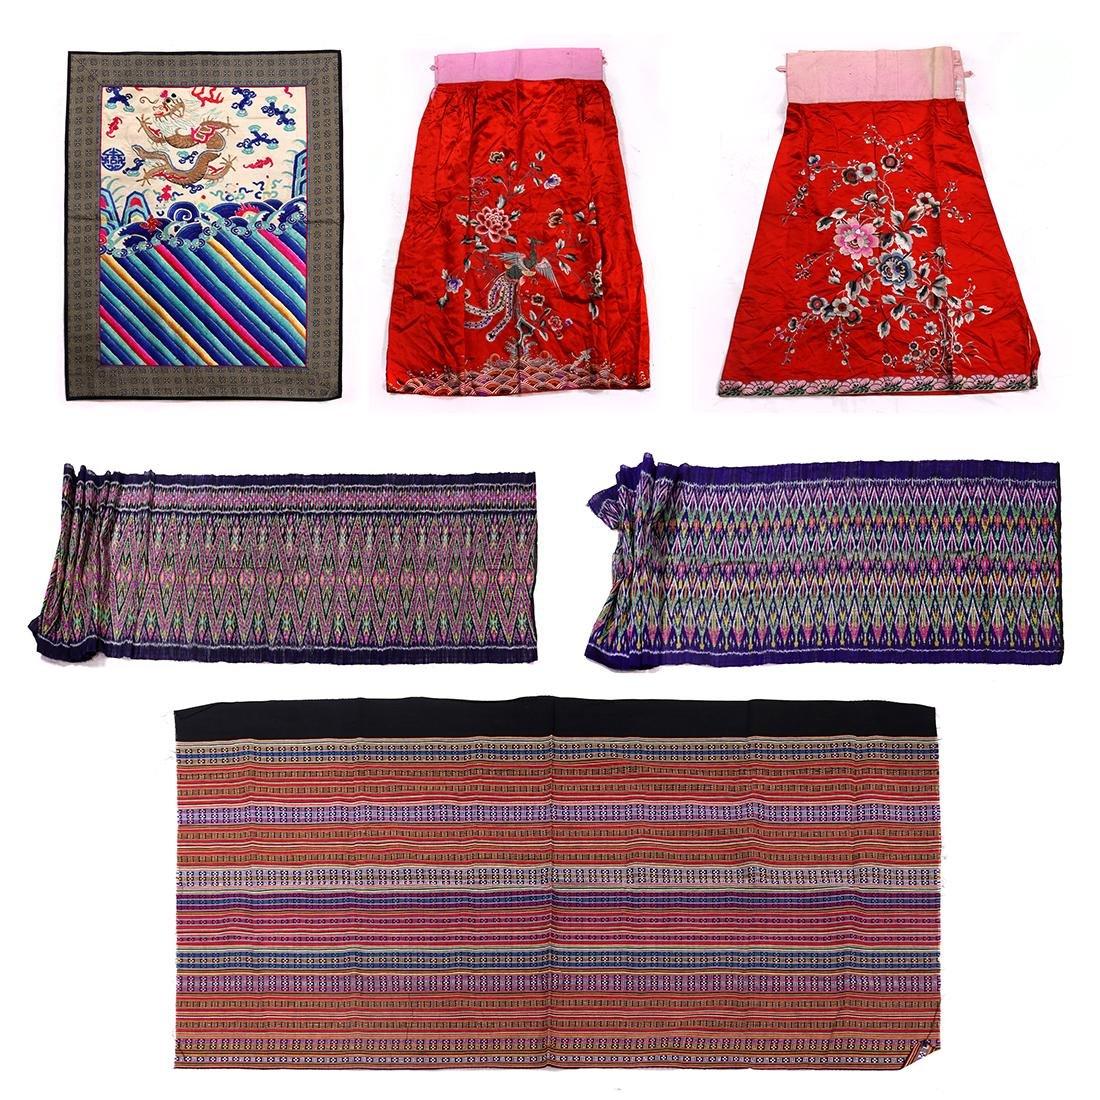 Selection of Asian Textiles